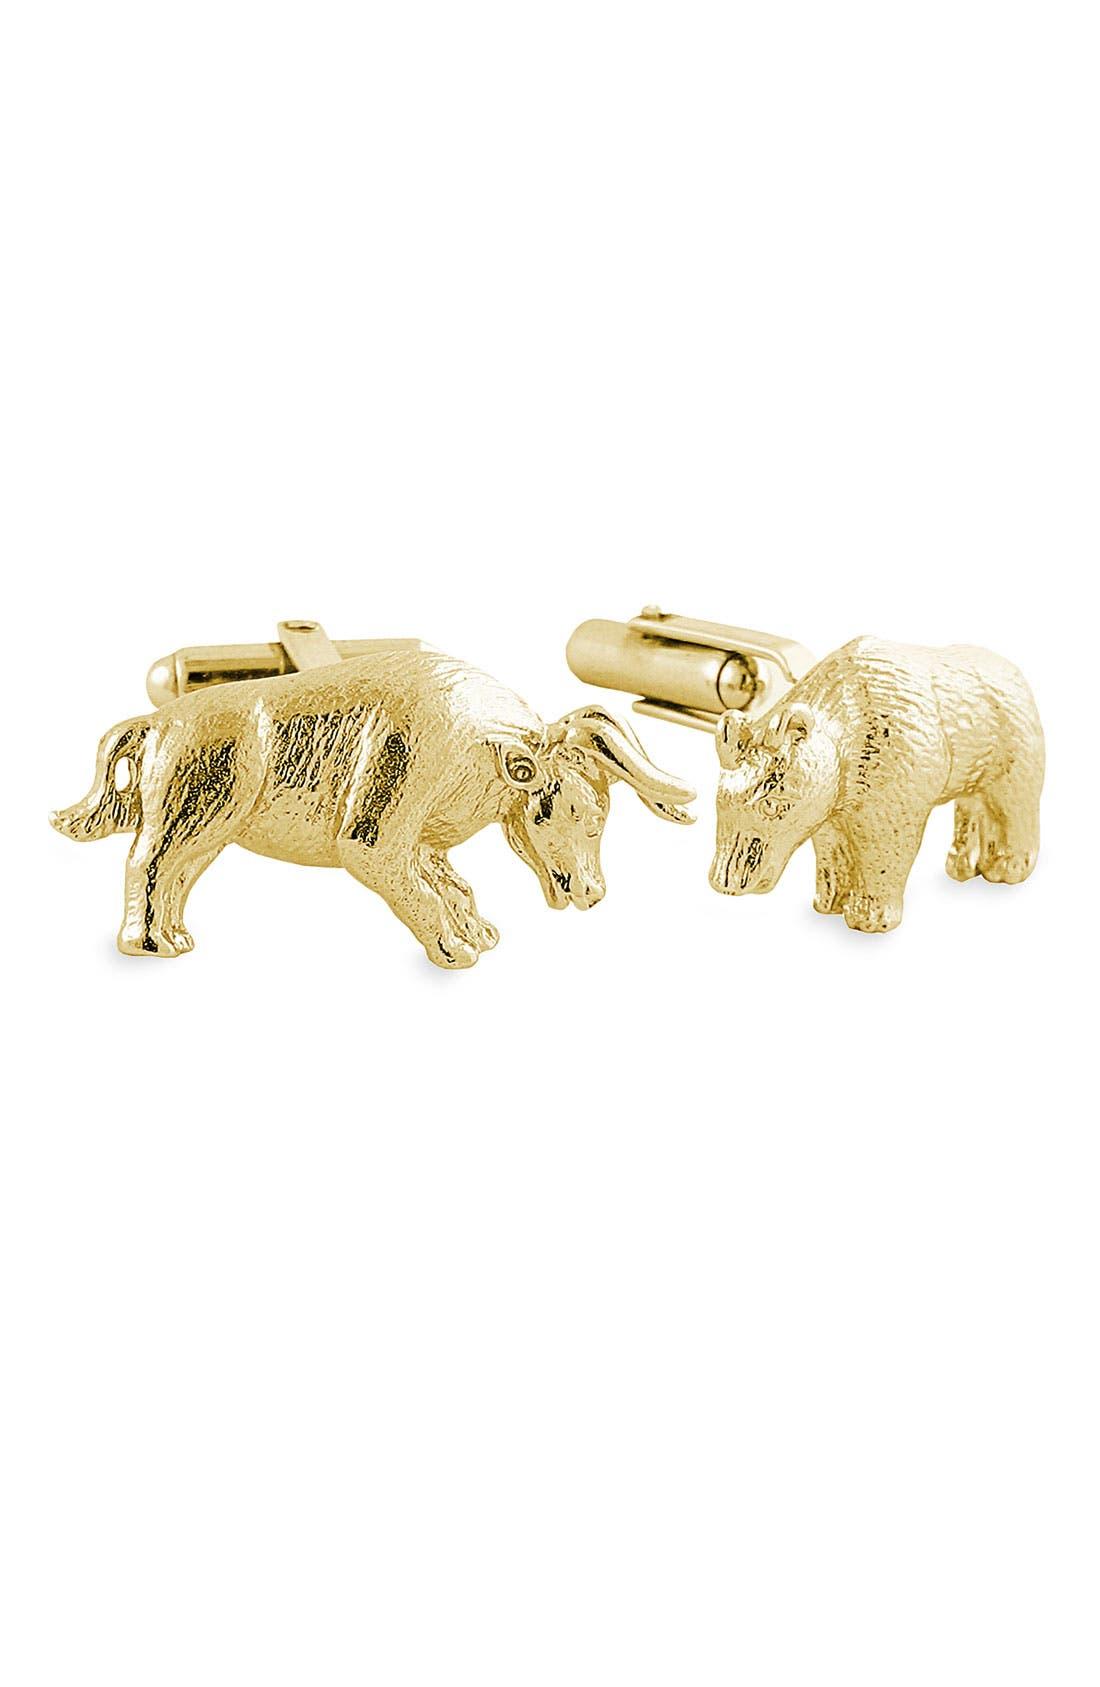 DAVID DONAHUE Bull & Bear Cuff Links